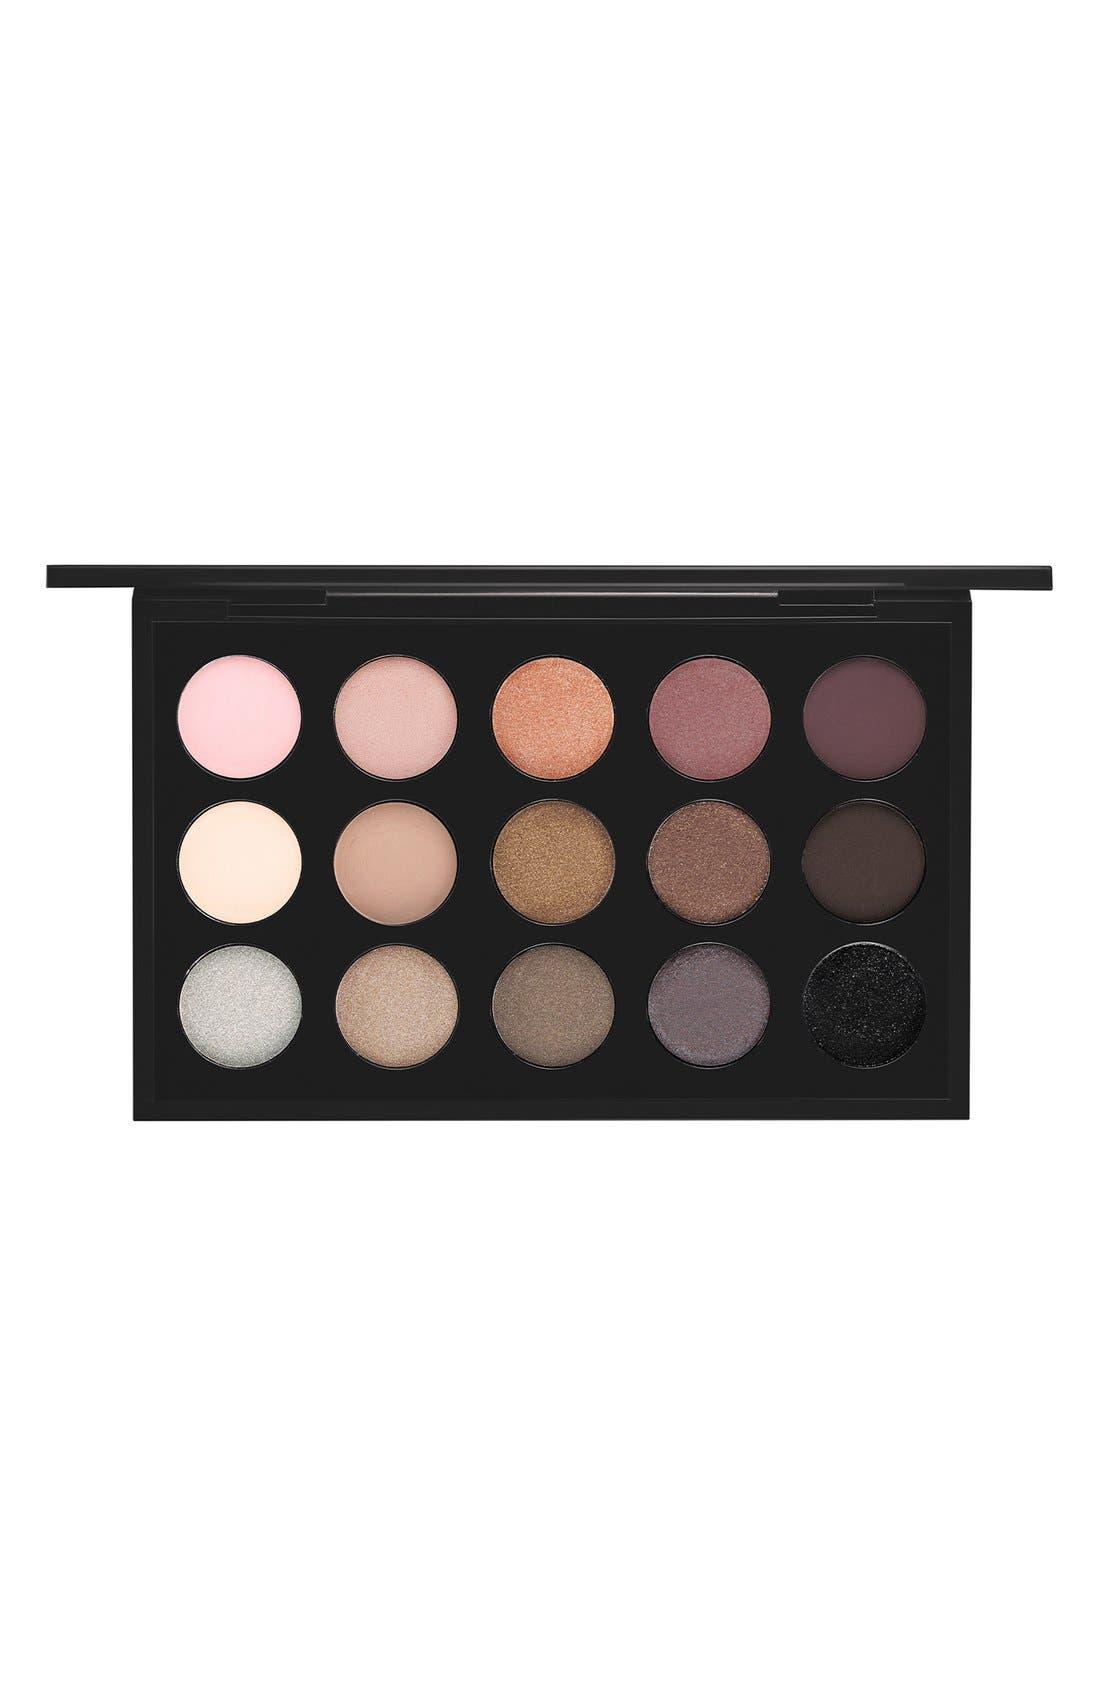 MAC Cool Neutral Times 15 Eyeshadow Palette ($101 Value)